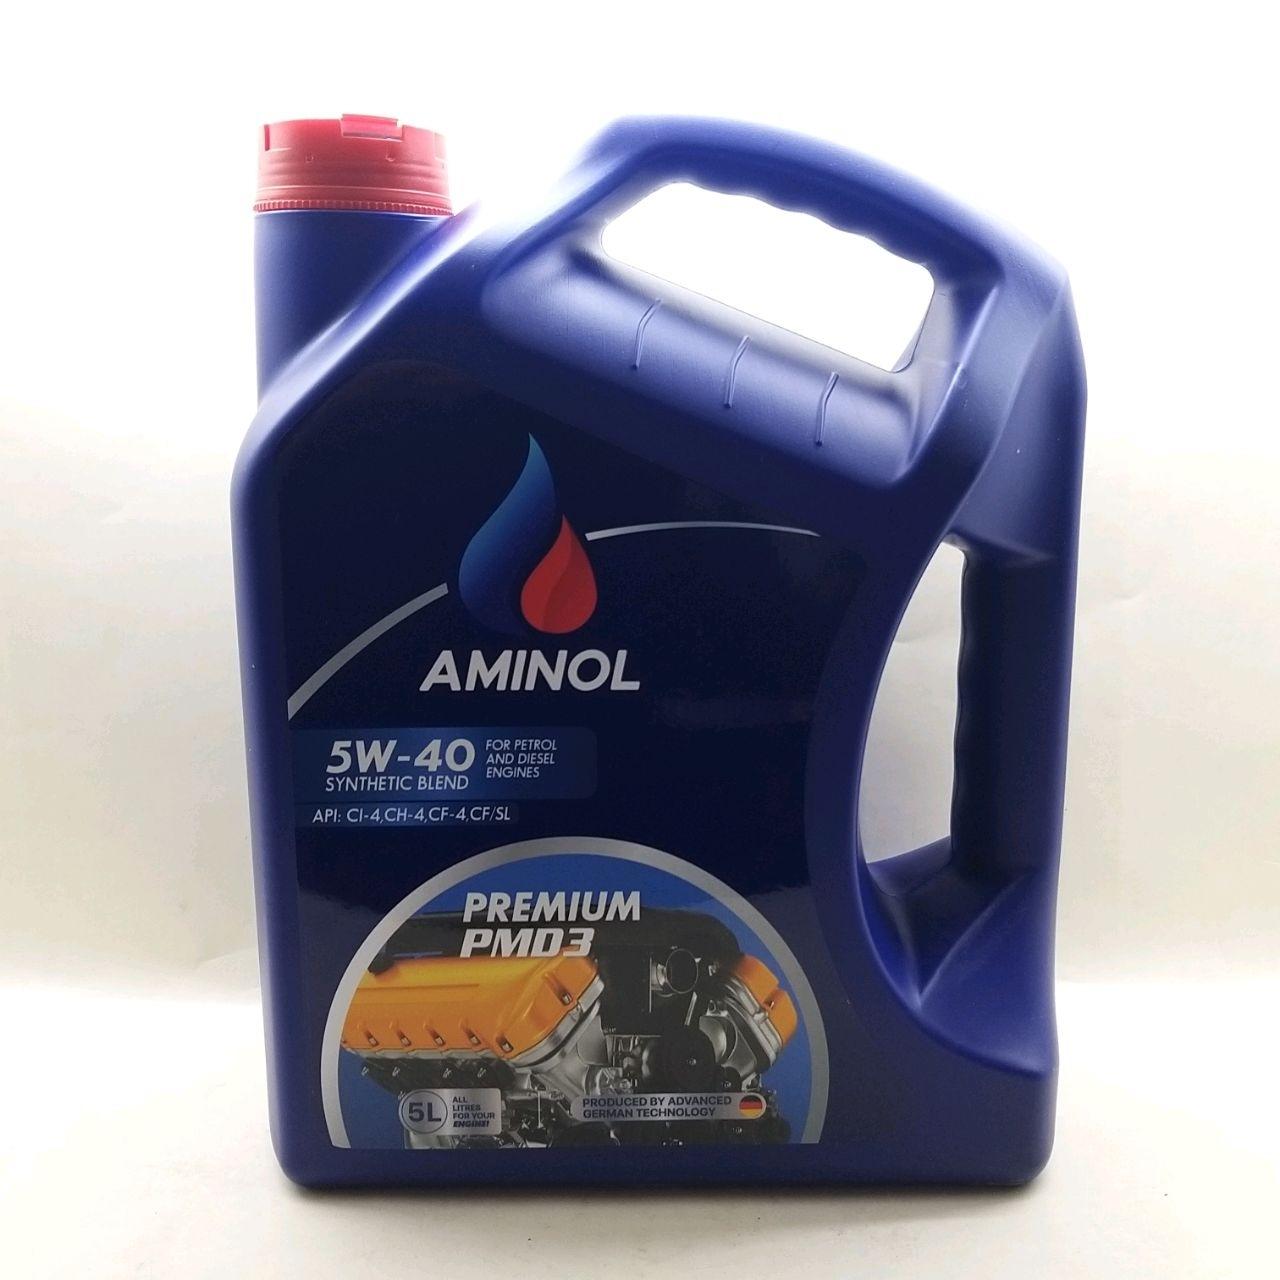 (250869)Aminol SUPER SPG3 5w-40 (SN/CF) 4L.